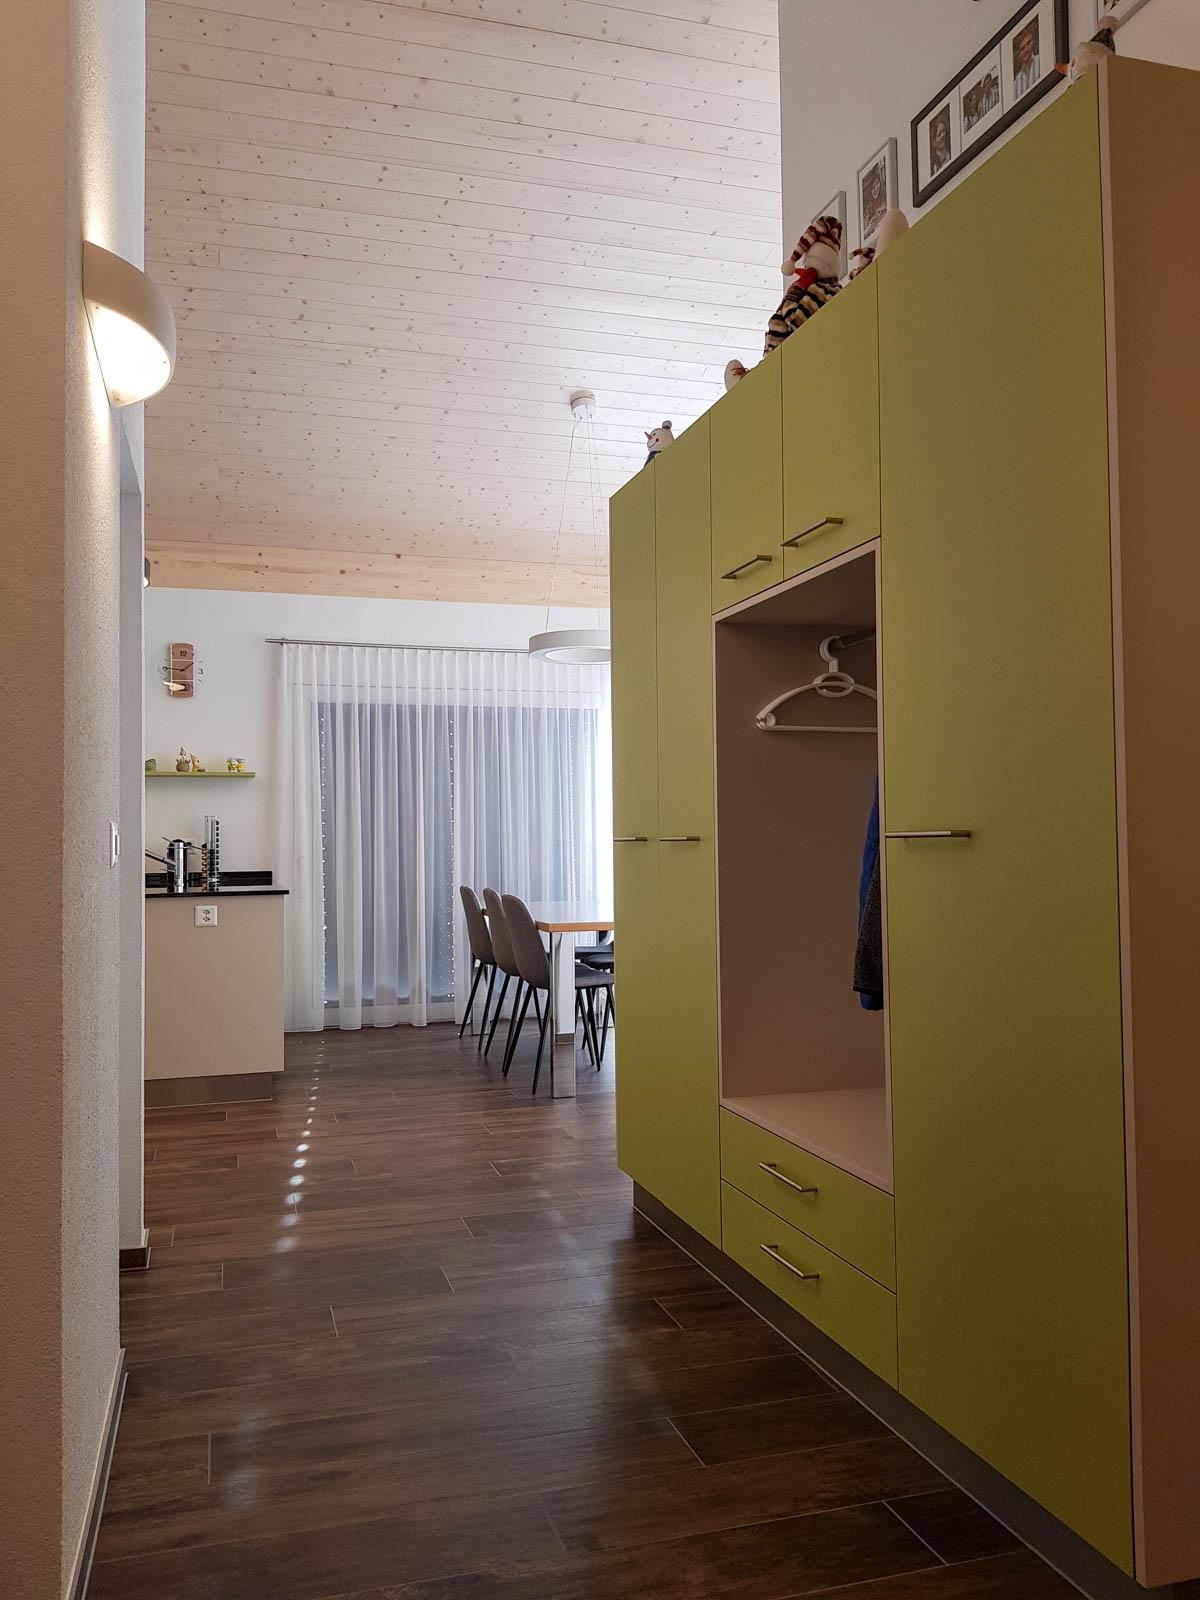 Wooddesign_Garderobe_Gästegarderobe_grün_beige_offene Gästegarderobe_Putzschrank (3)